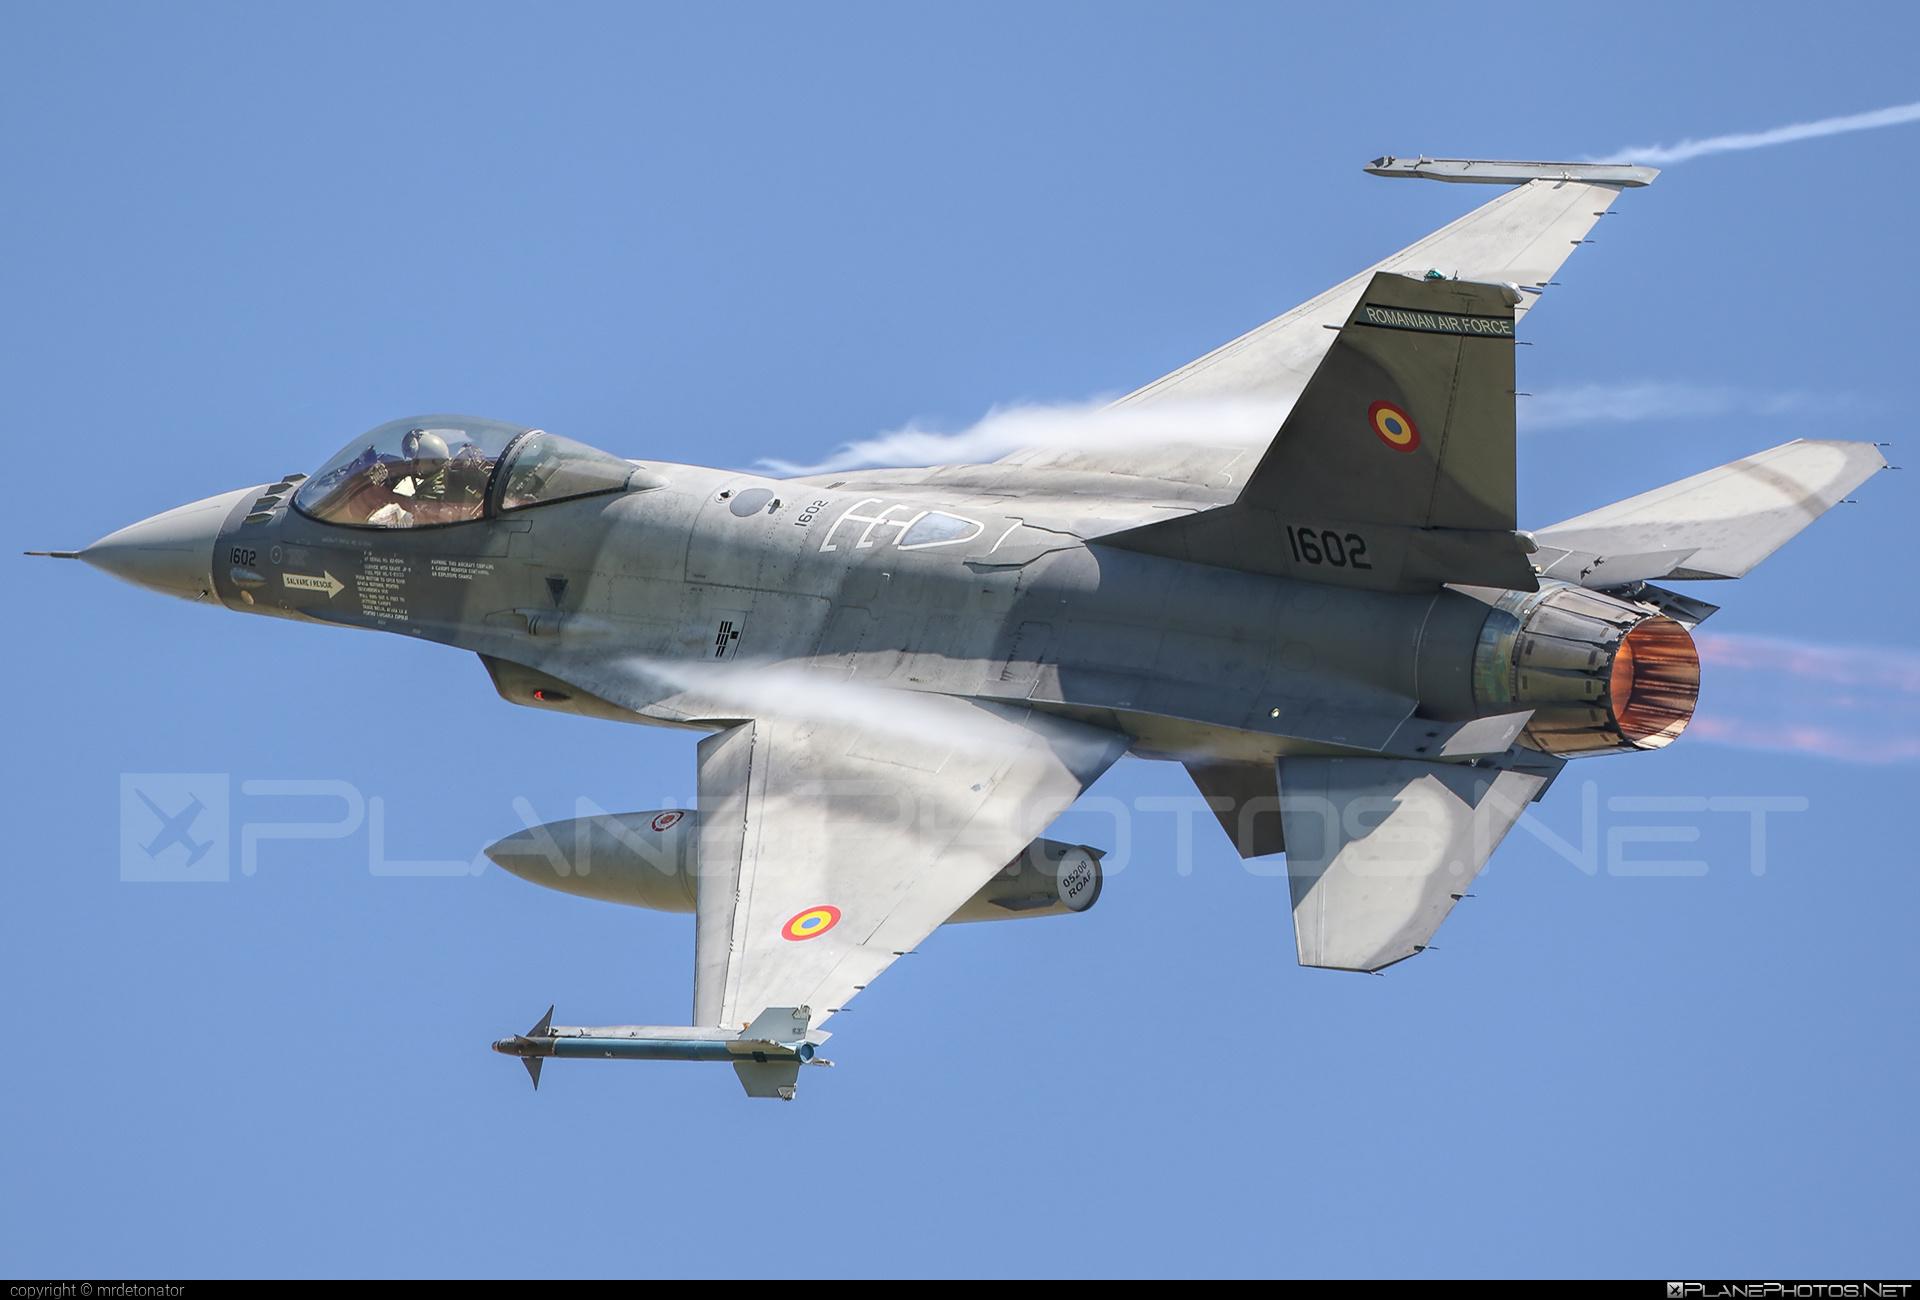 General Dynamics F-16AM Fighting Falcon - 1602 operated by Forţele Aeriene Române (Romanian Air Force) #f16 #f16am #fightingfalcon #forteleaerieneromane #generaldynamics #romanianairforce